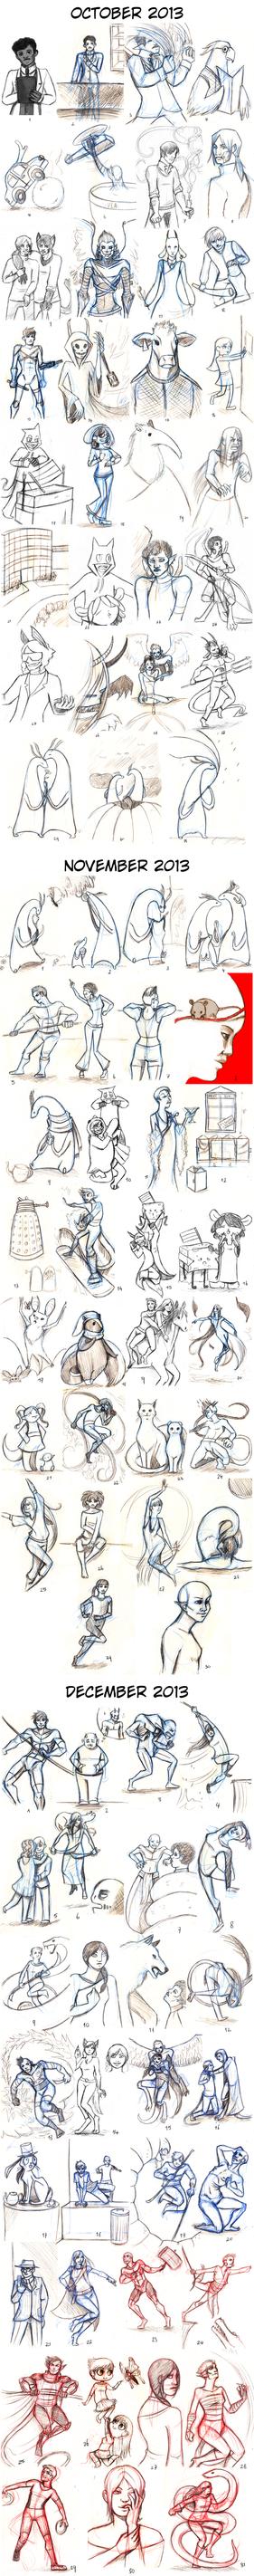 Doodle a Day 2013 - October to December by Super-kip